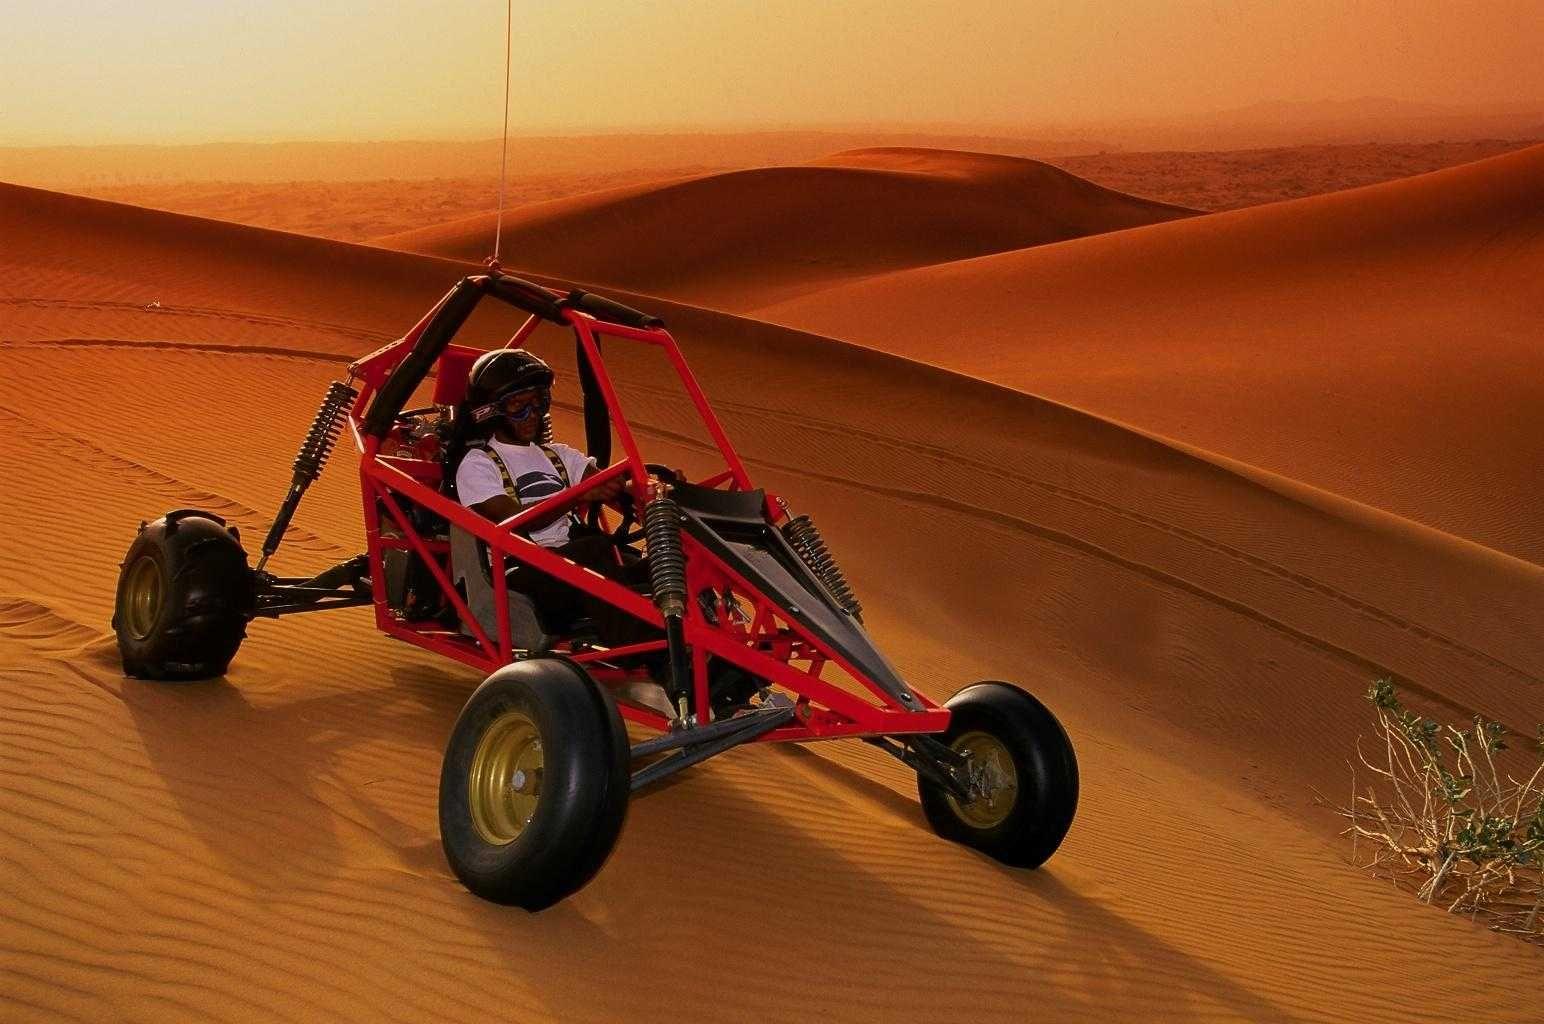 Dhow Cruise Dubai Camp; Dubai City Tours Dubai Dune Buggy